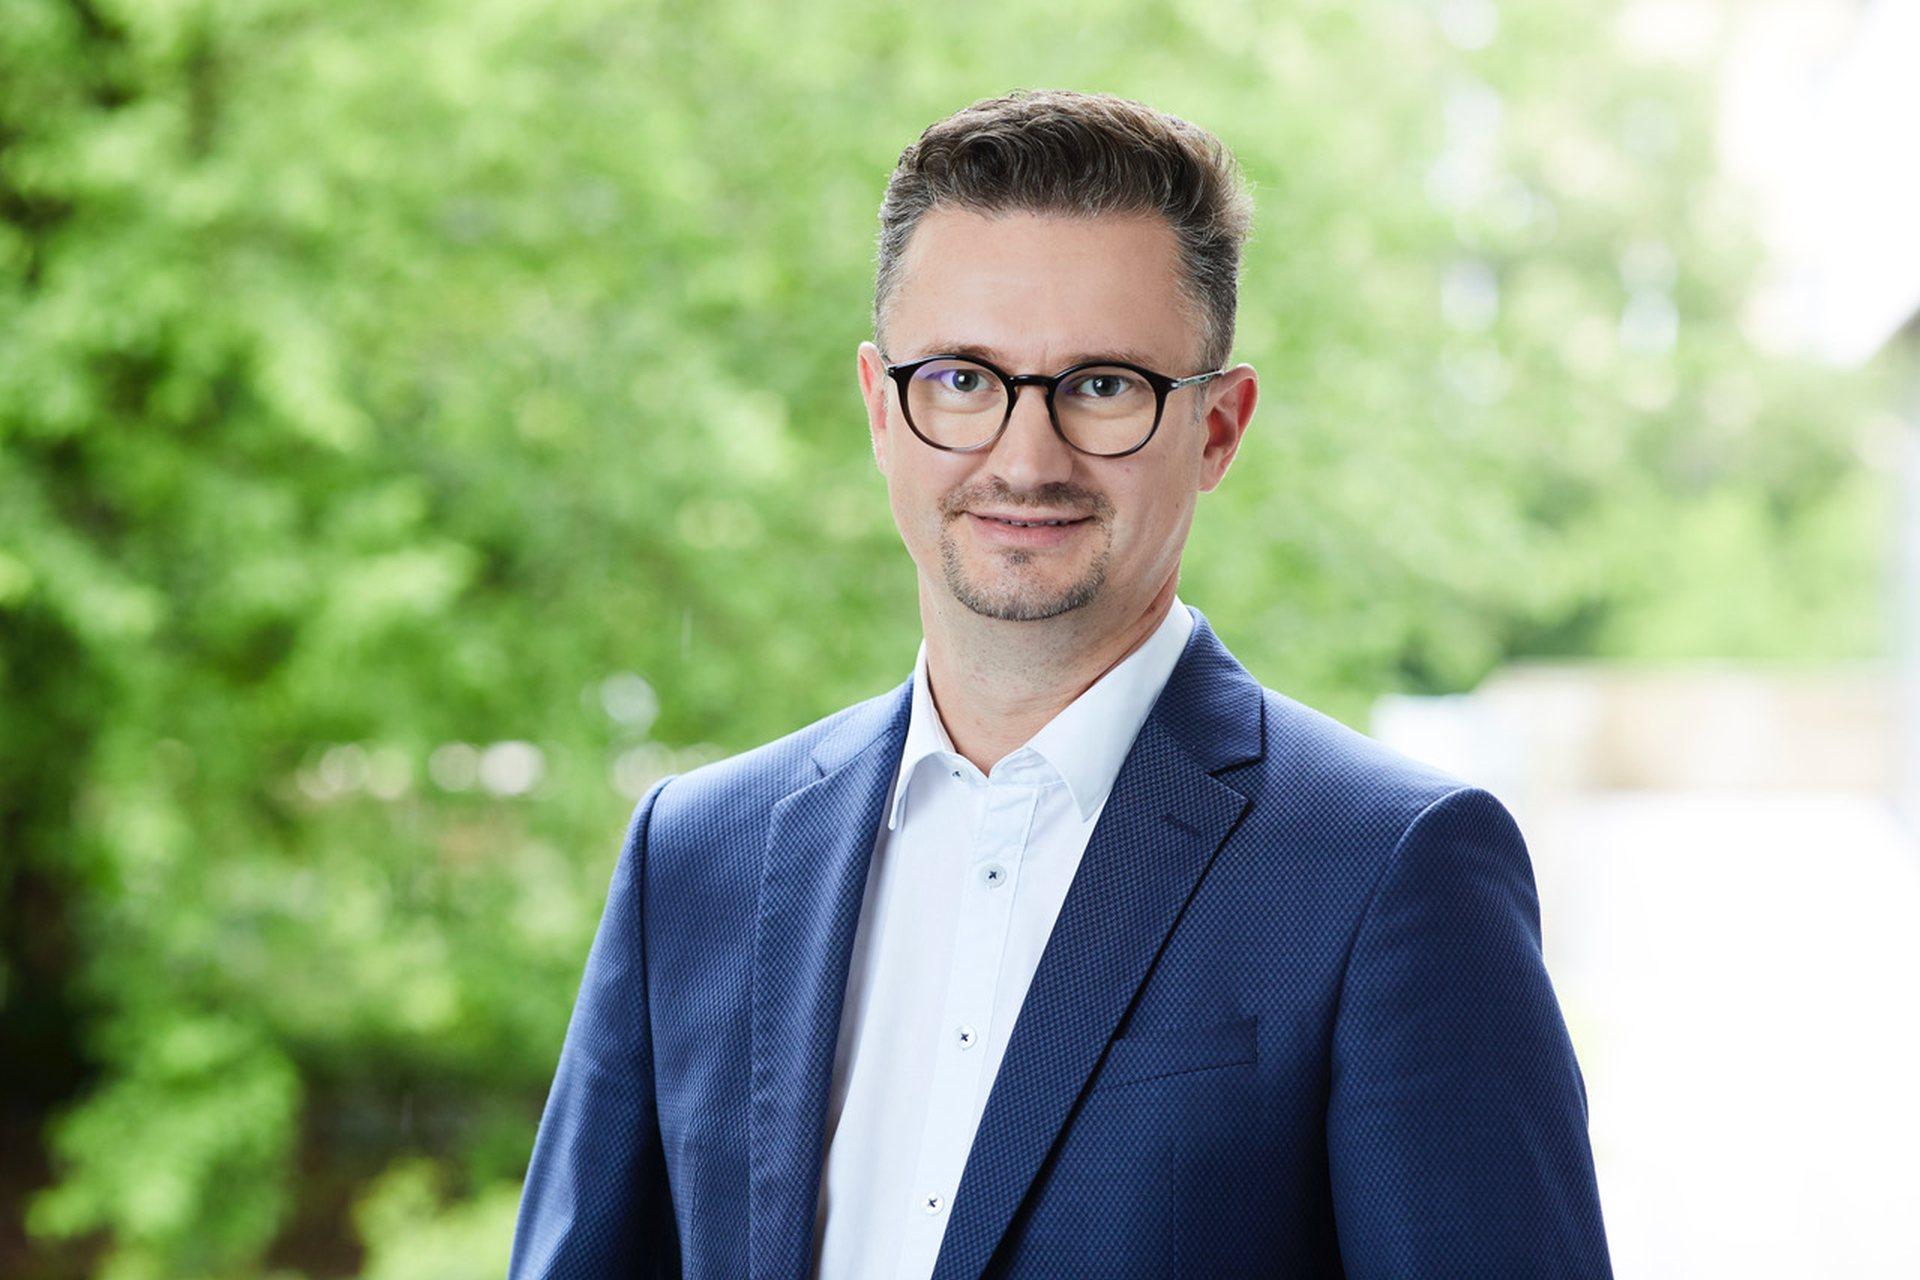 MdL Christian Tischner (CDU)